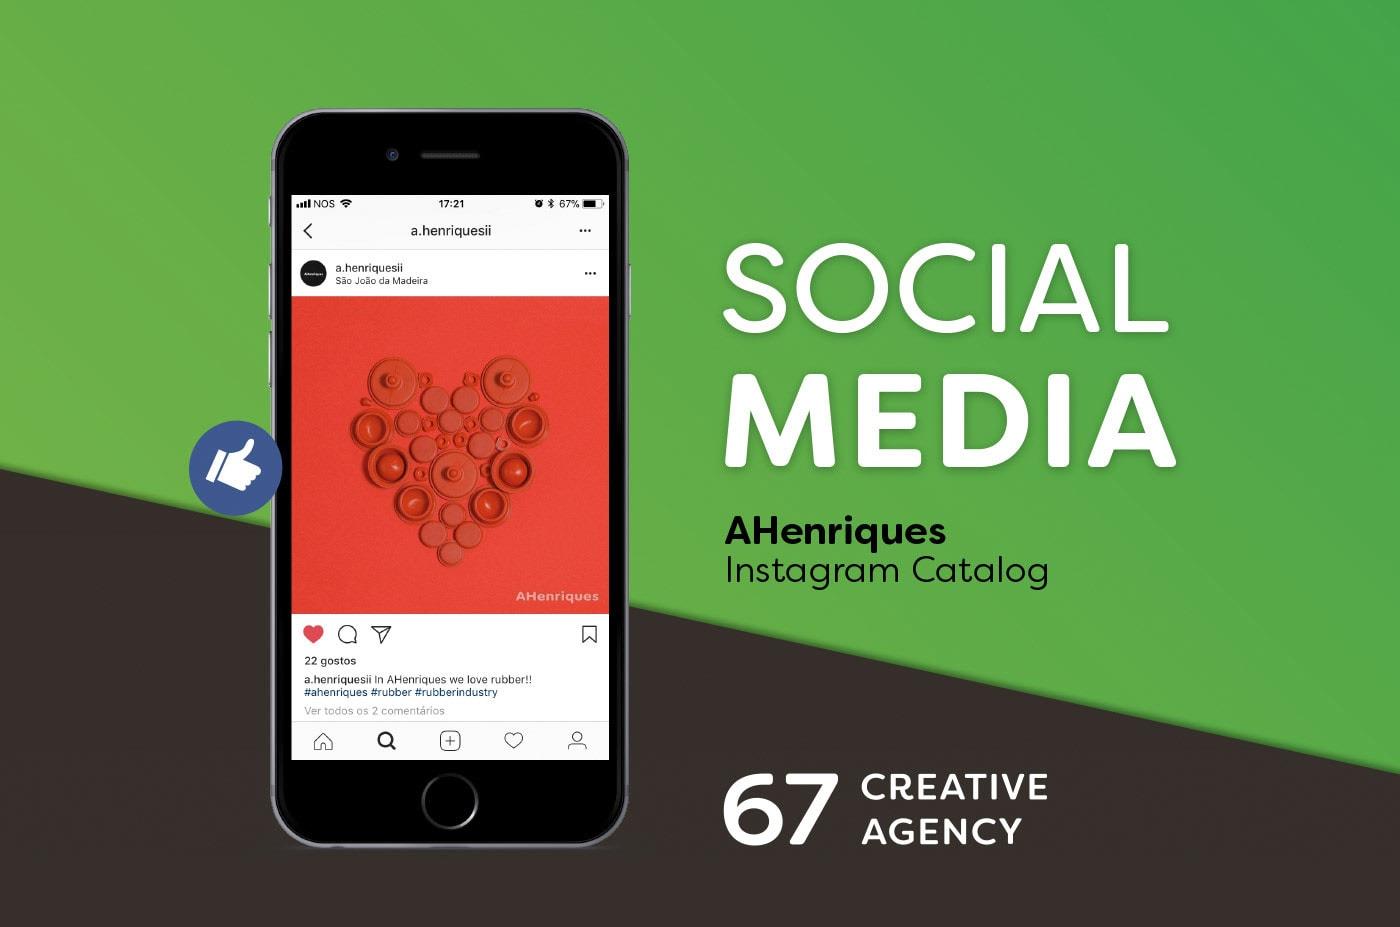 AHenriques, social media, instagram catalog, photography